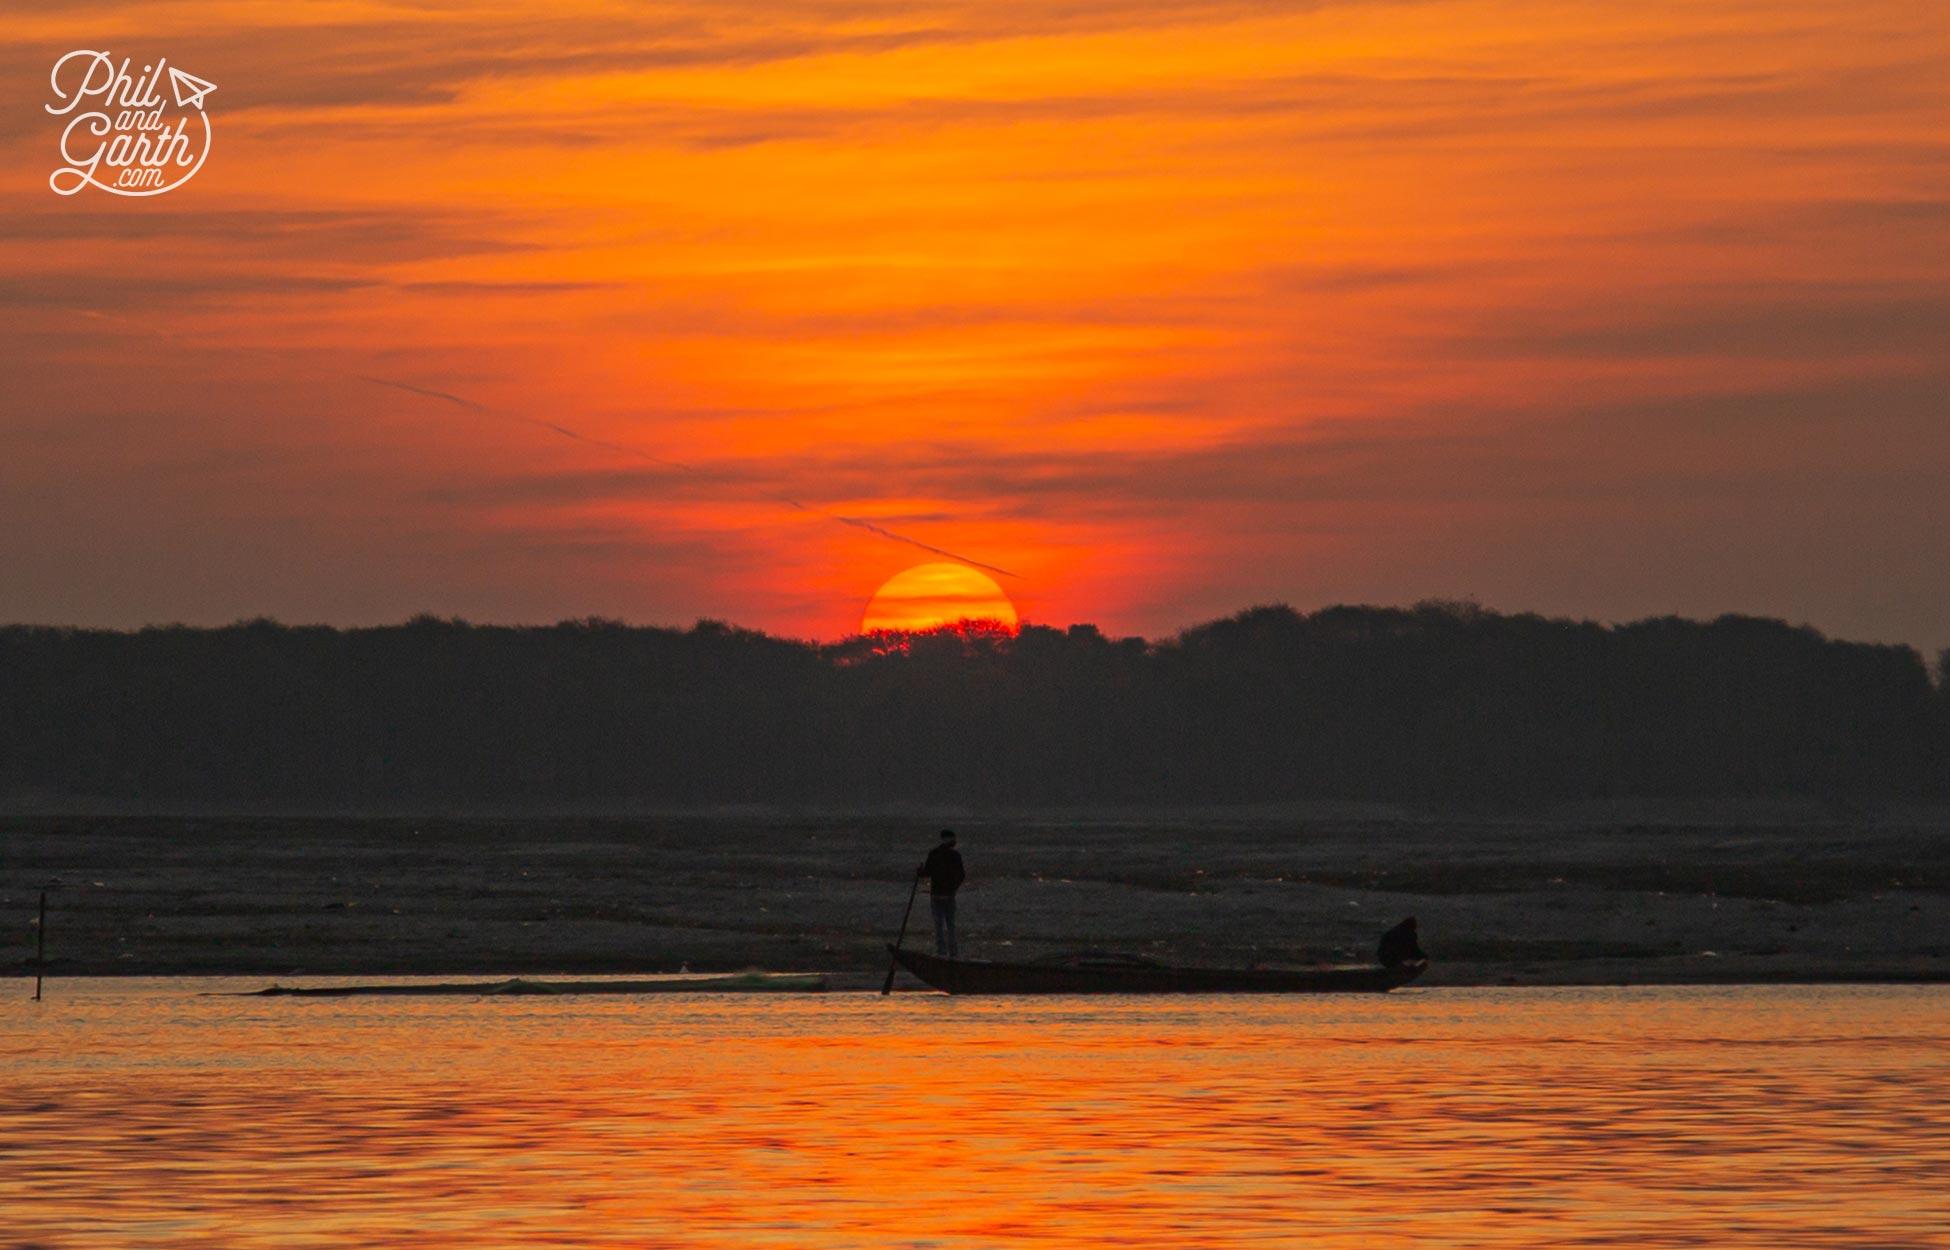 Daybreak over the River Ganges